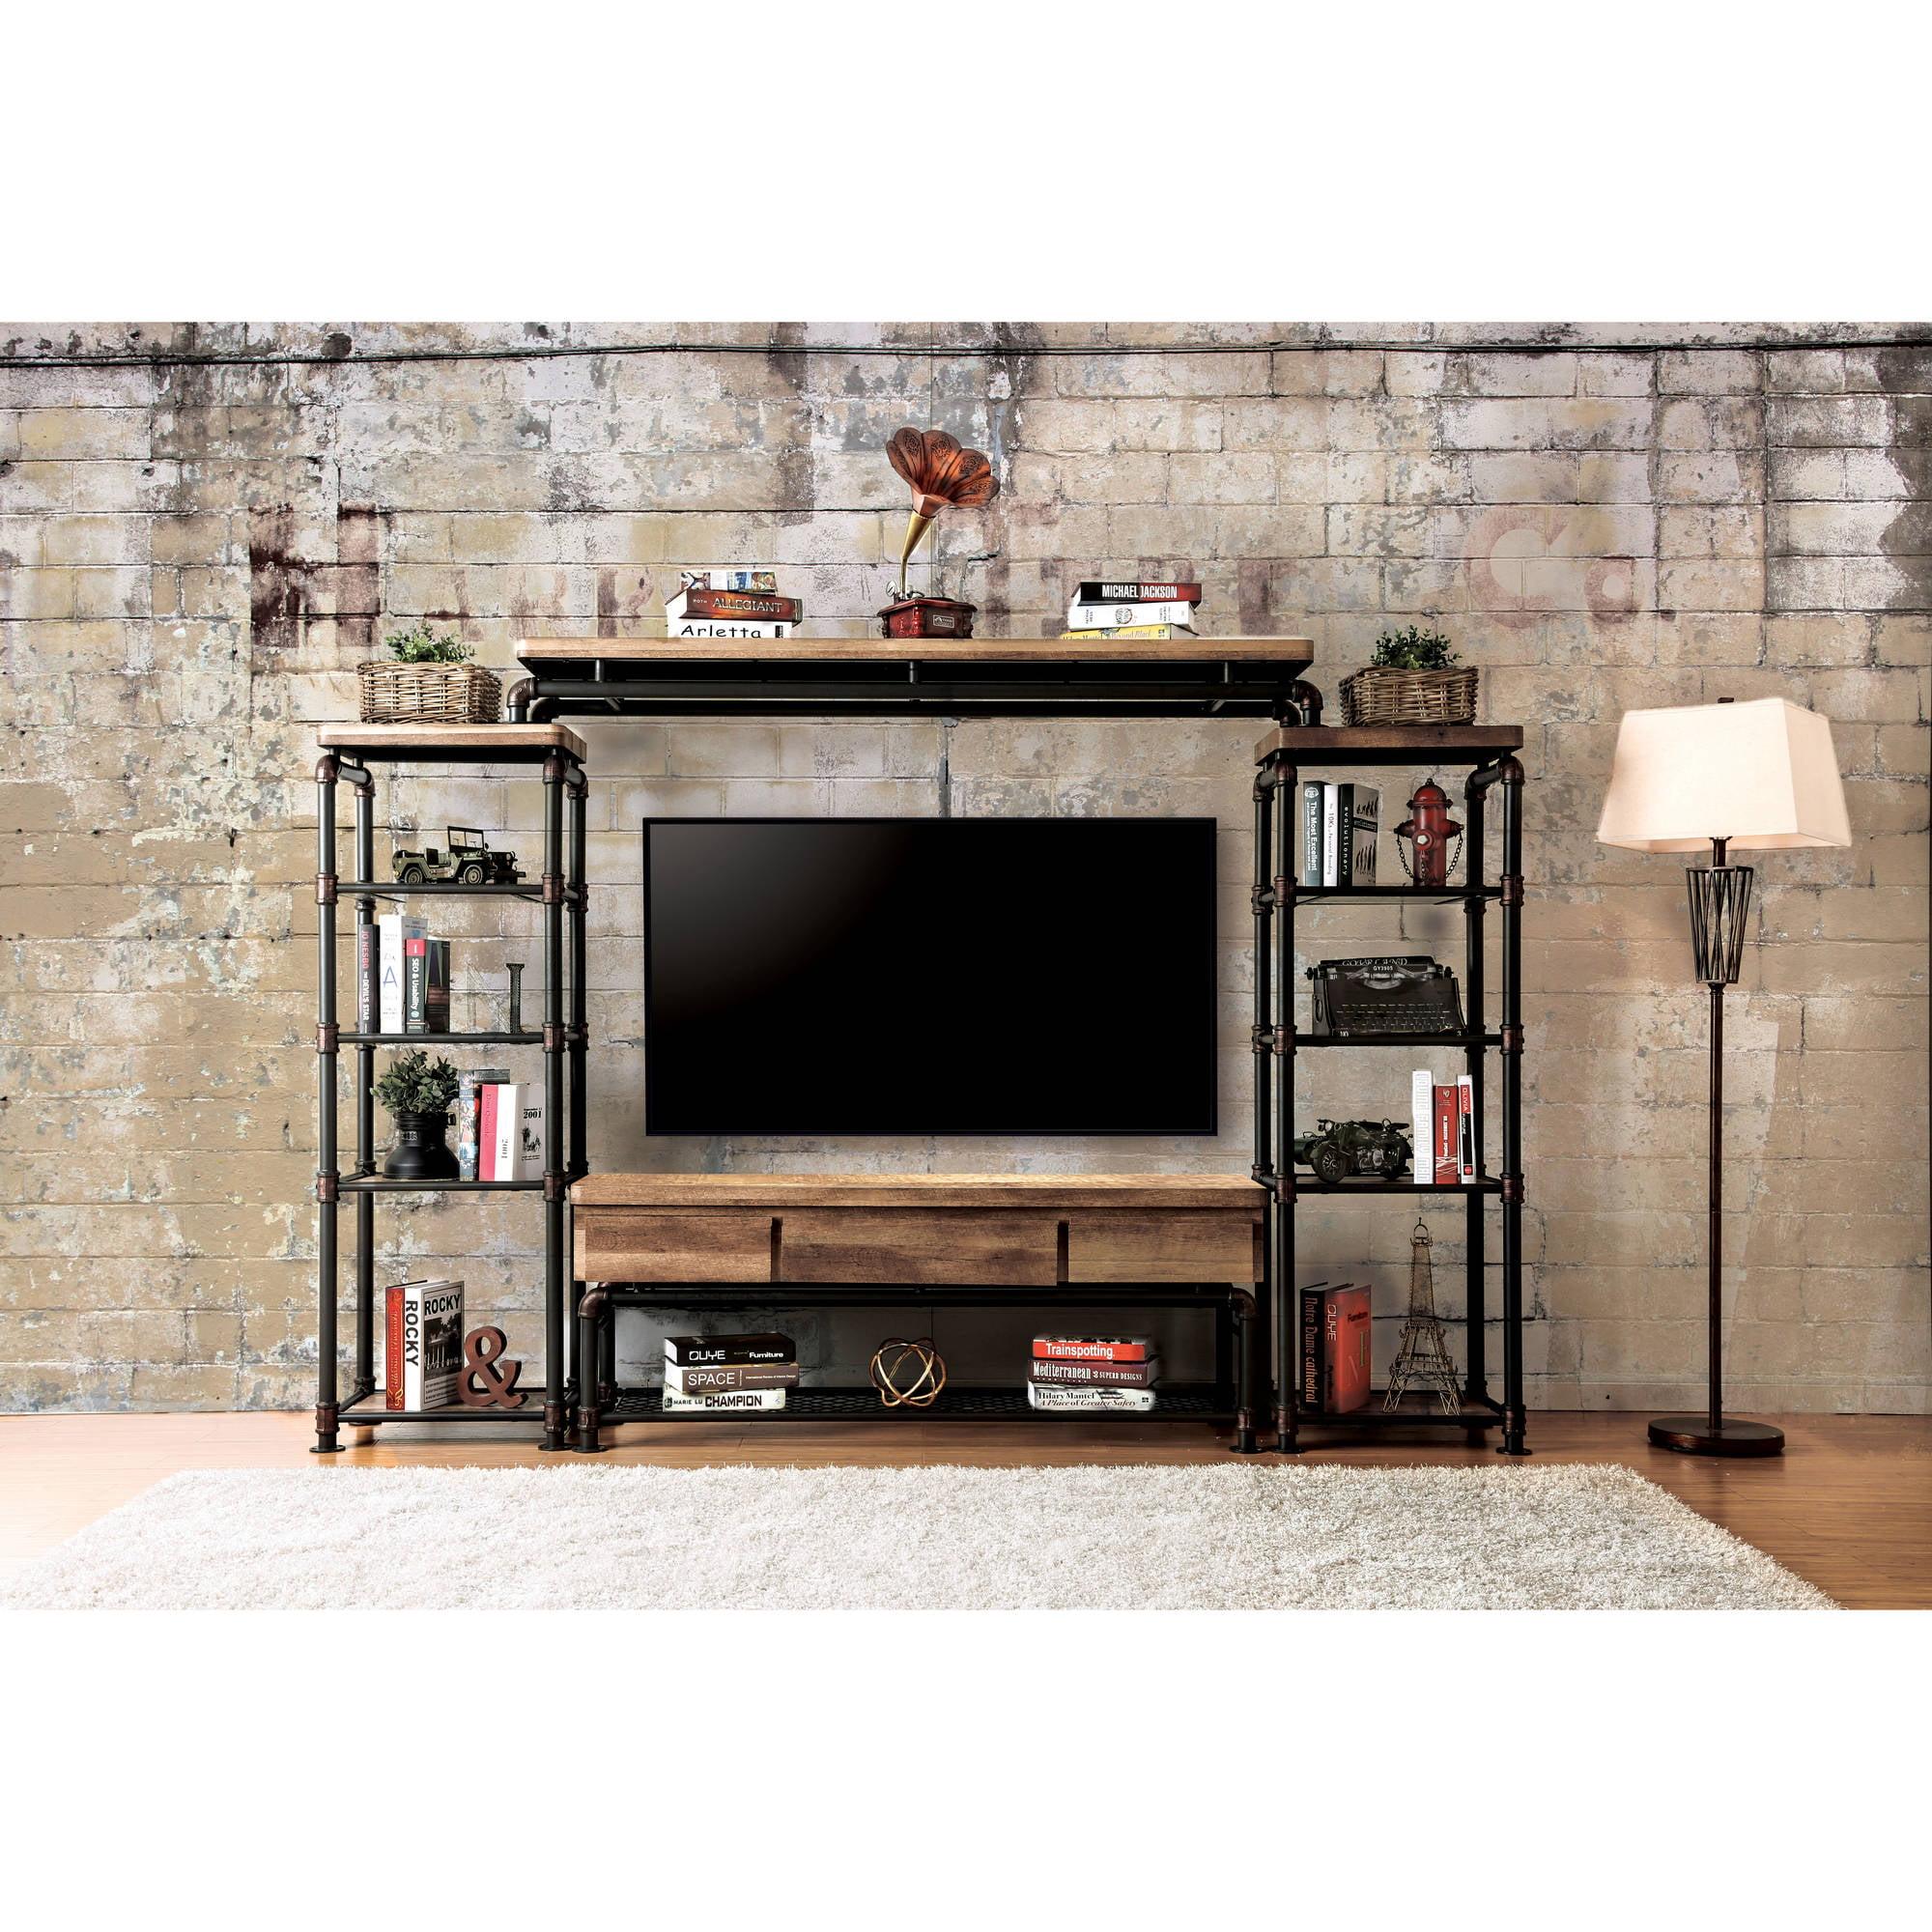 Furniture of America Velmer Industrial 4-Piece Entertainment Unit, Antique Black